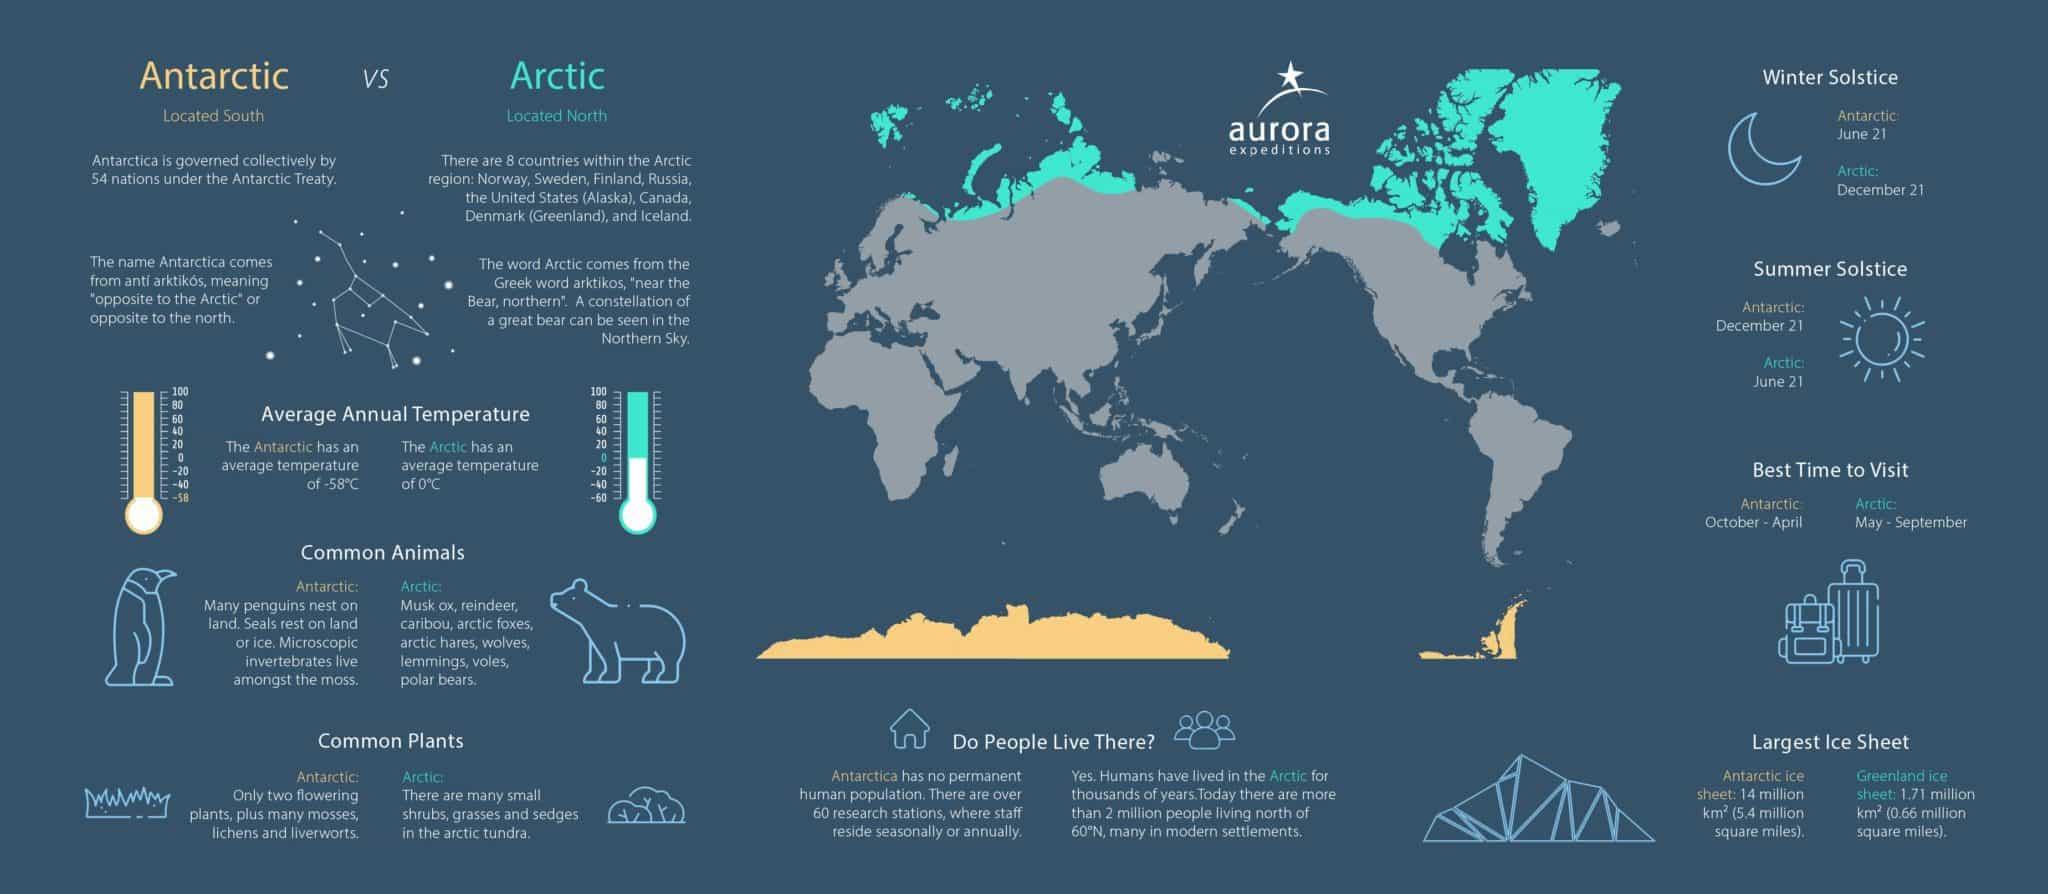 Arctic vs Antarctica Infographic